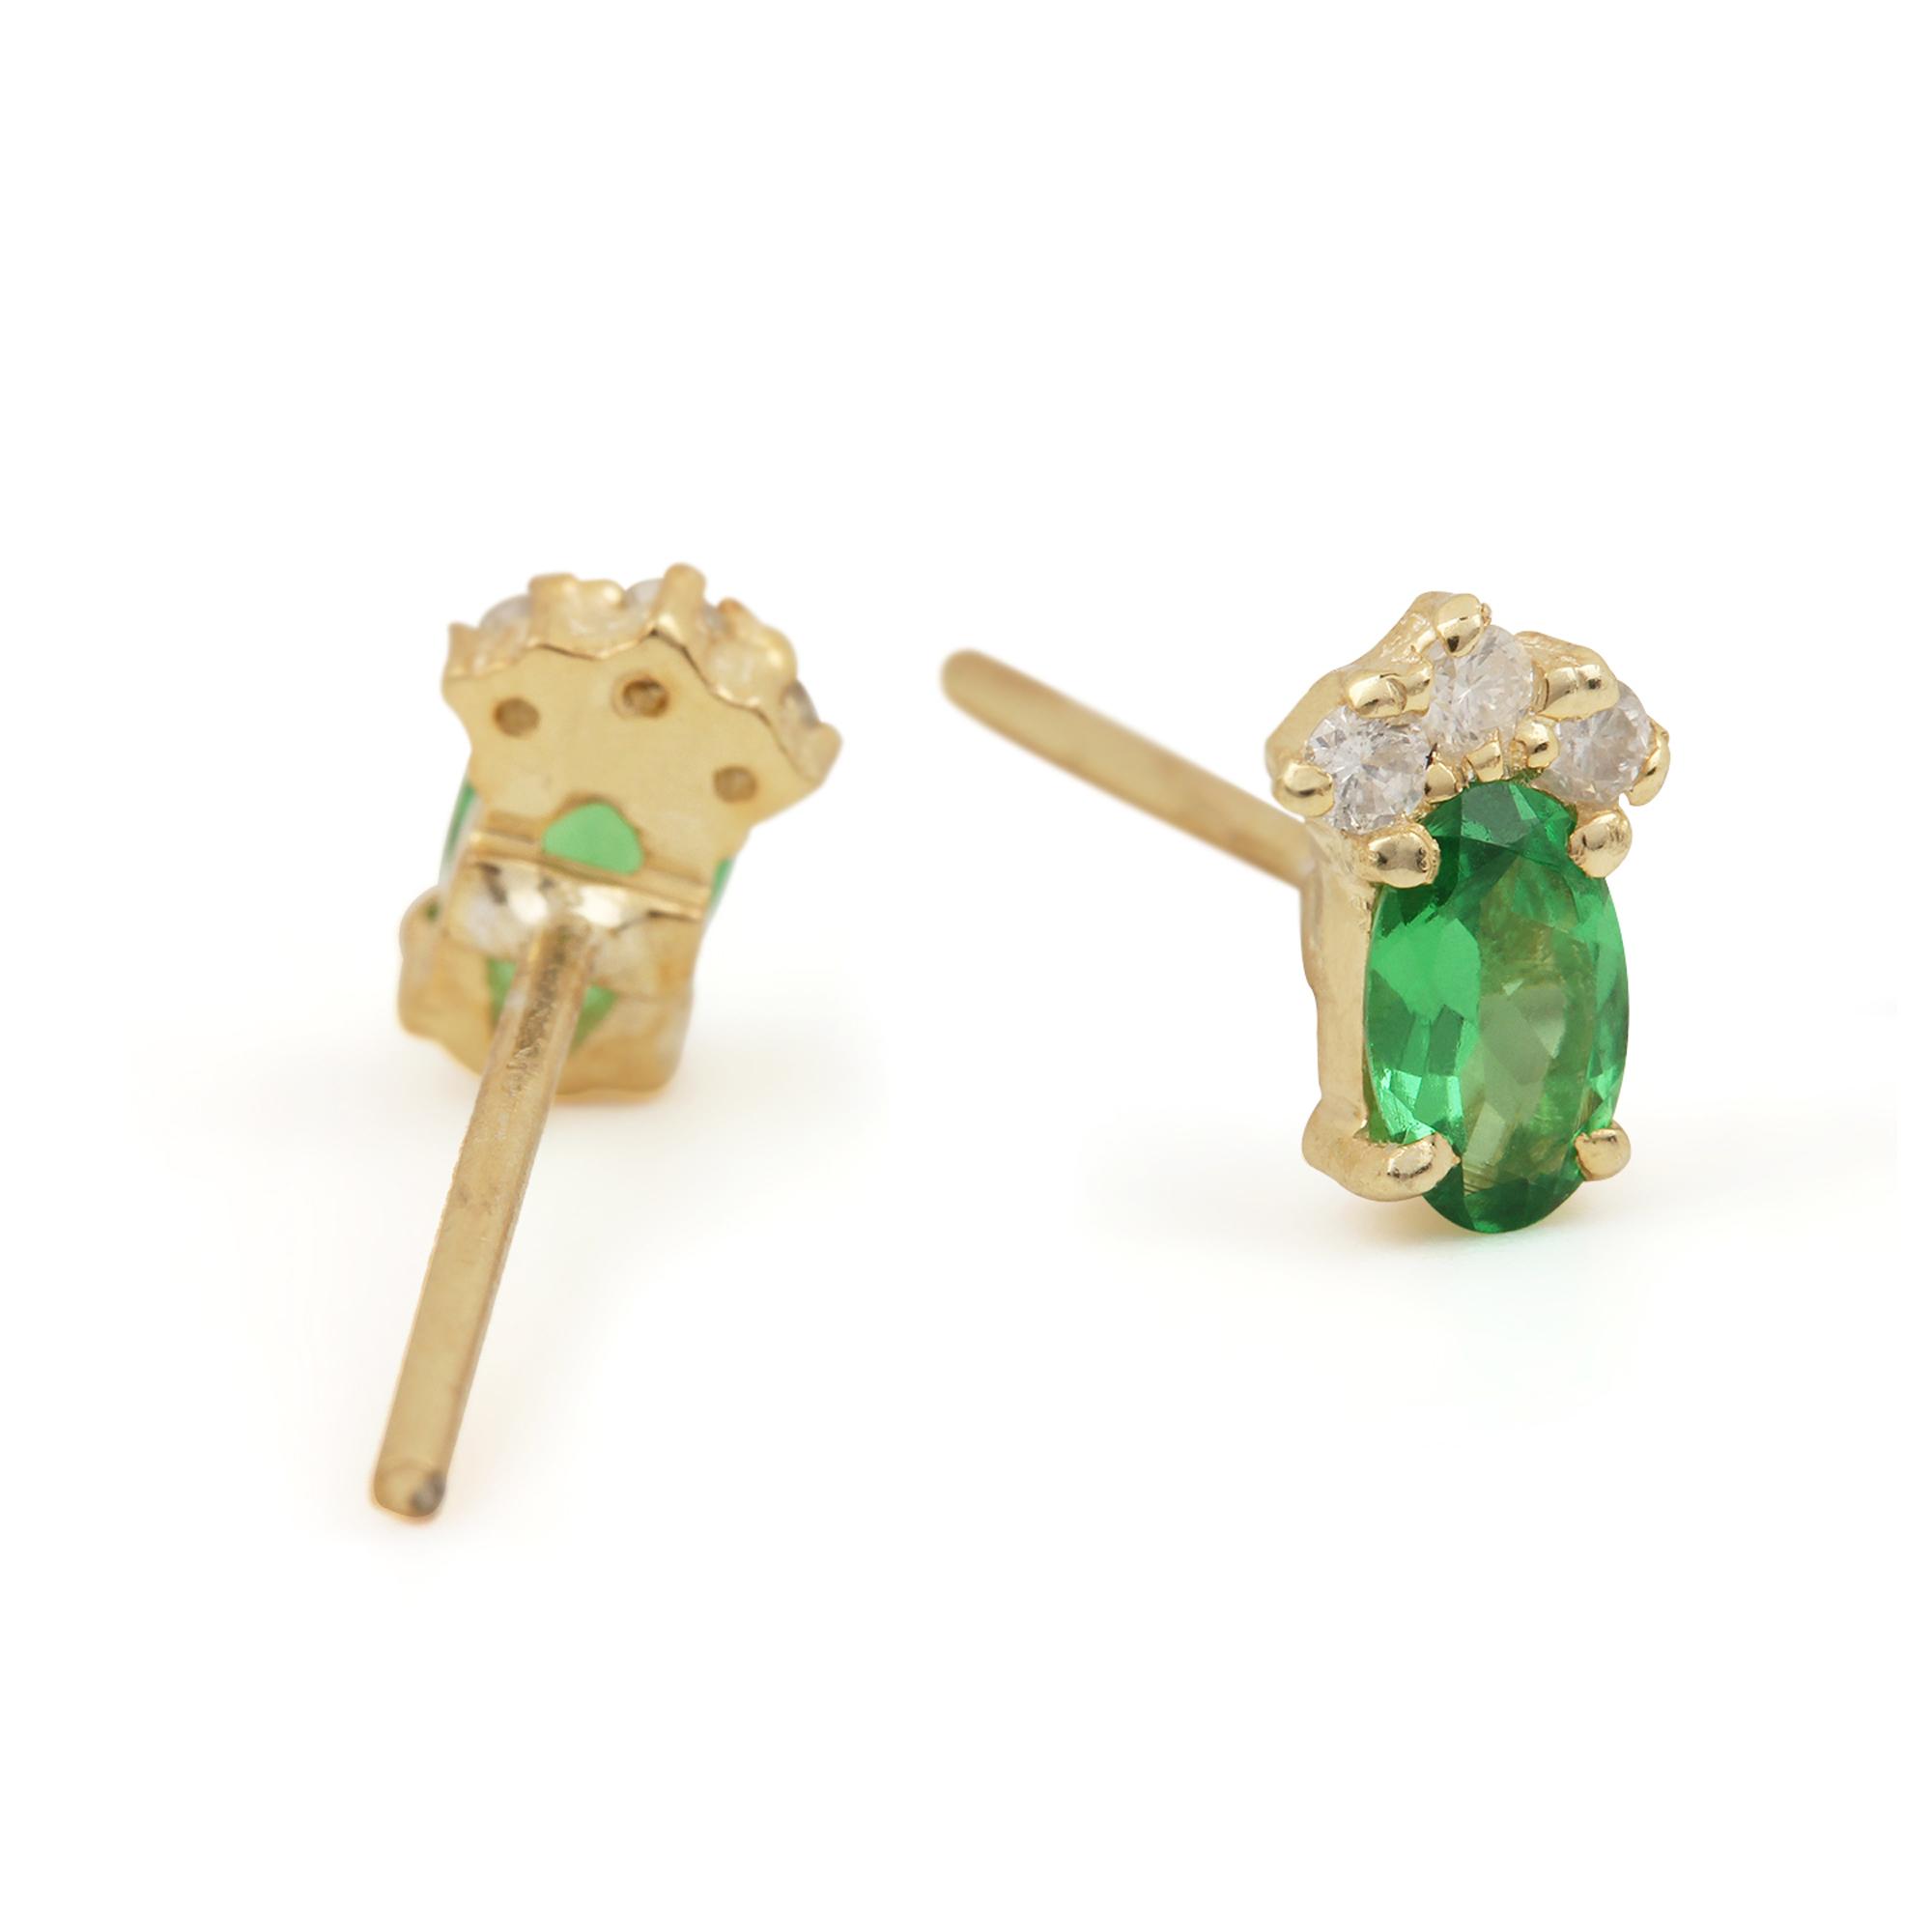 14k Solid Gold Diamond & Tsavorite Gemstone Solitaire Stud Earrings Handmade Jewelry